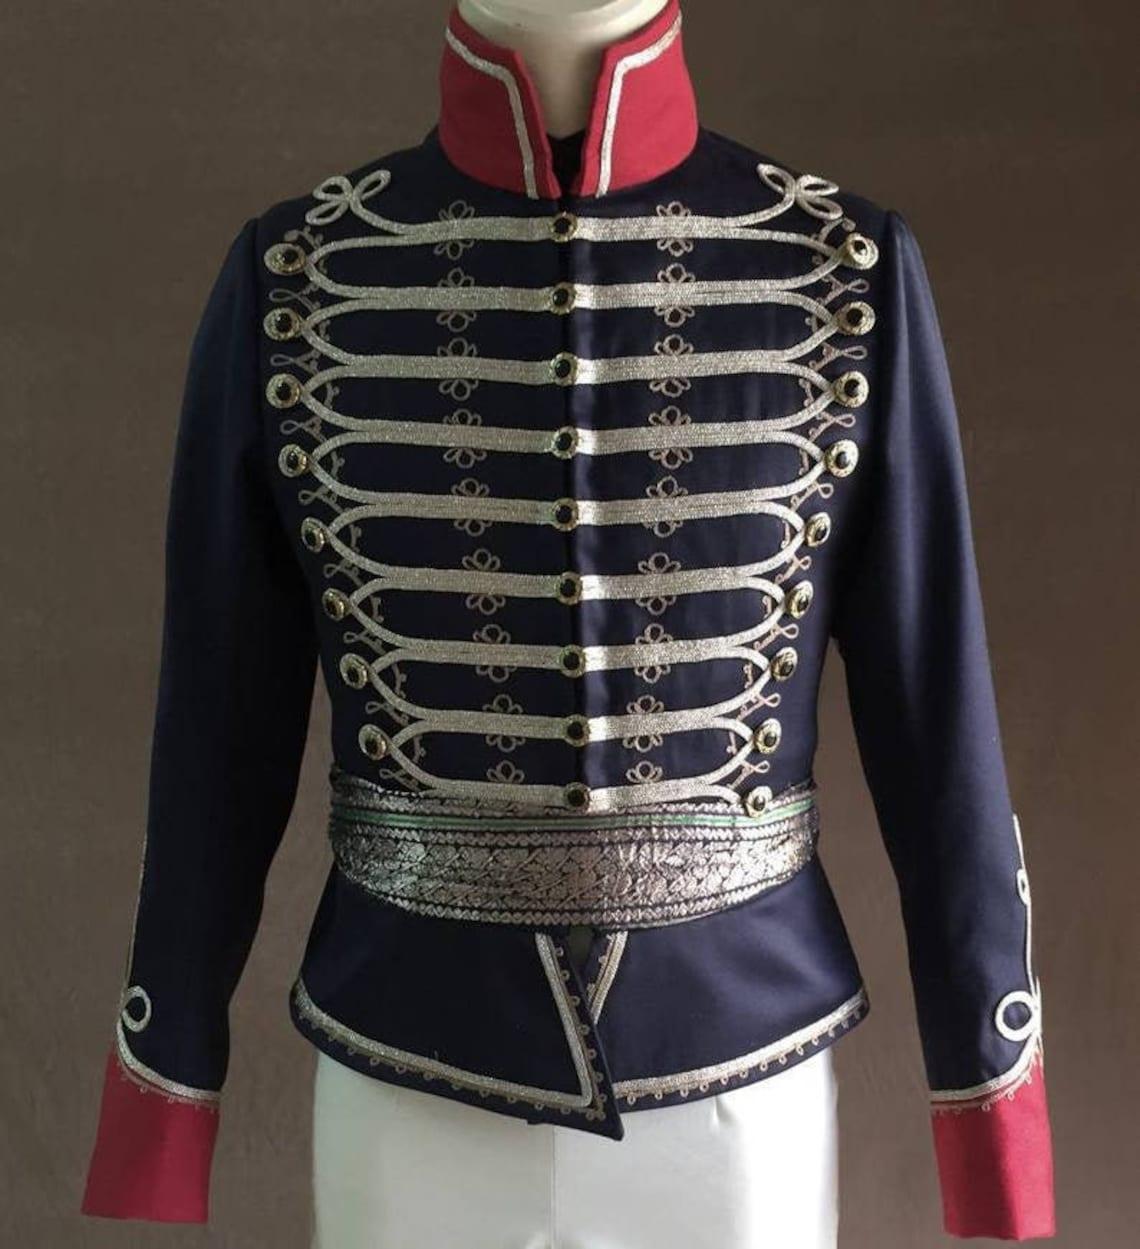 1800s Hussar Uniform,mens Natal Carbineers Officers Patrol Jacket,mens Military Style Jacket